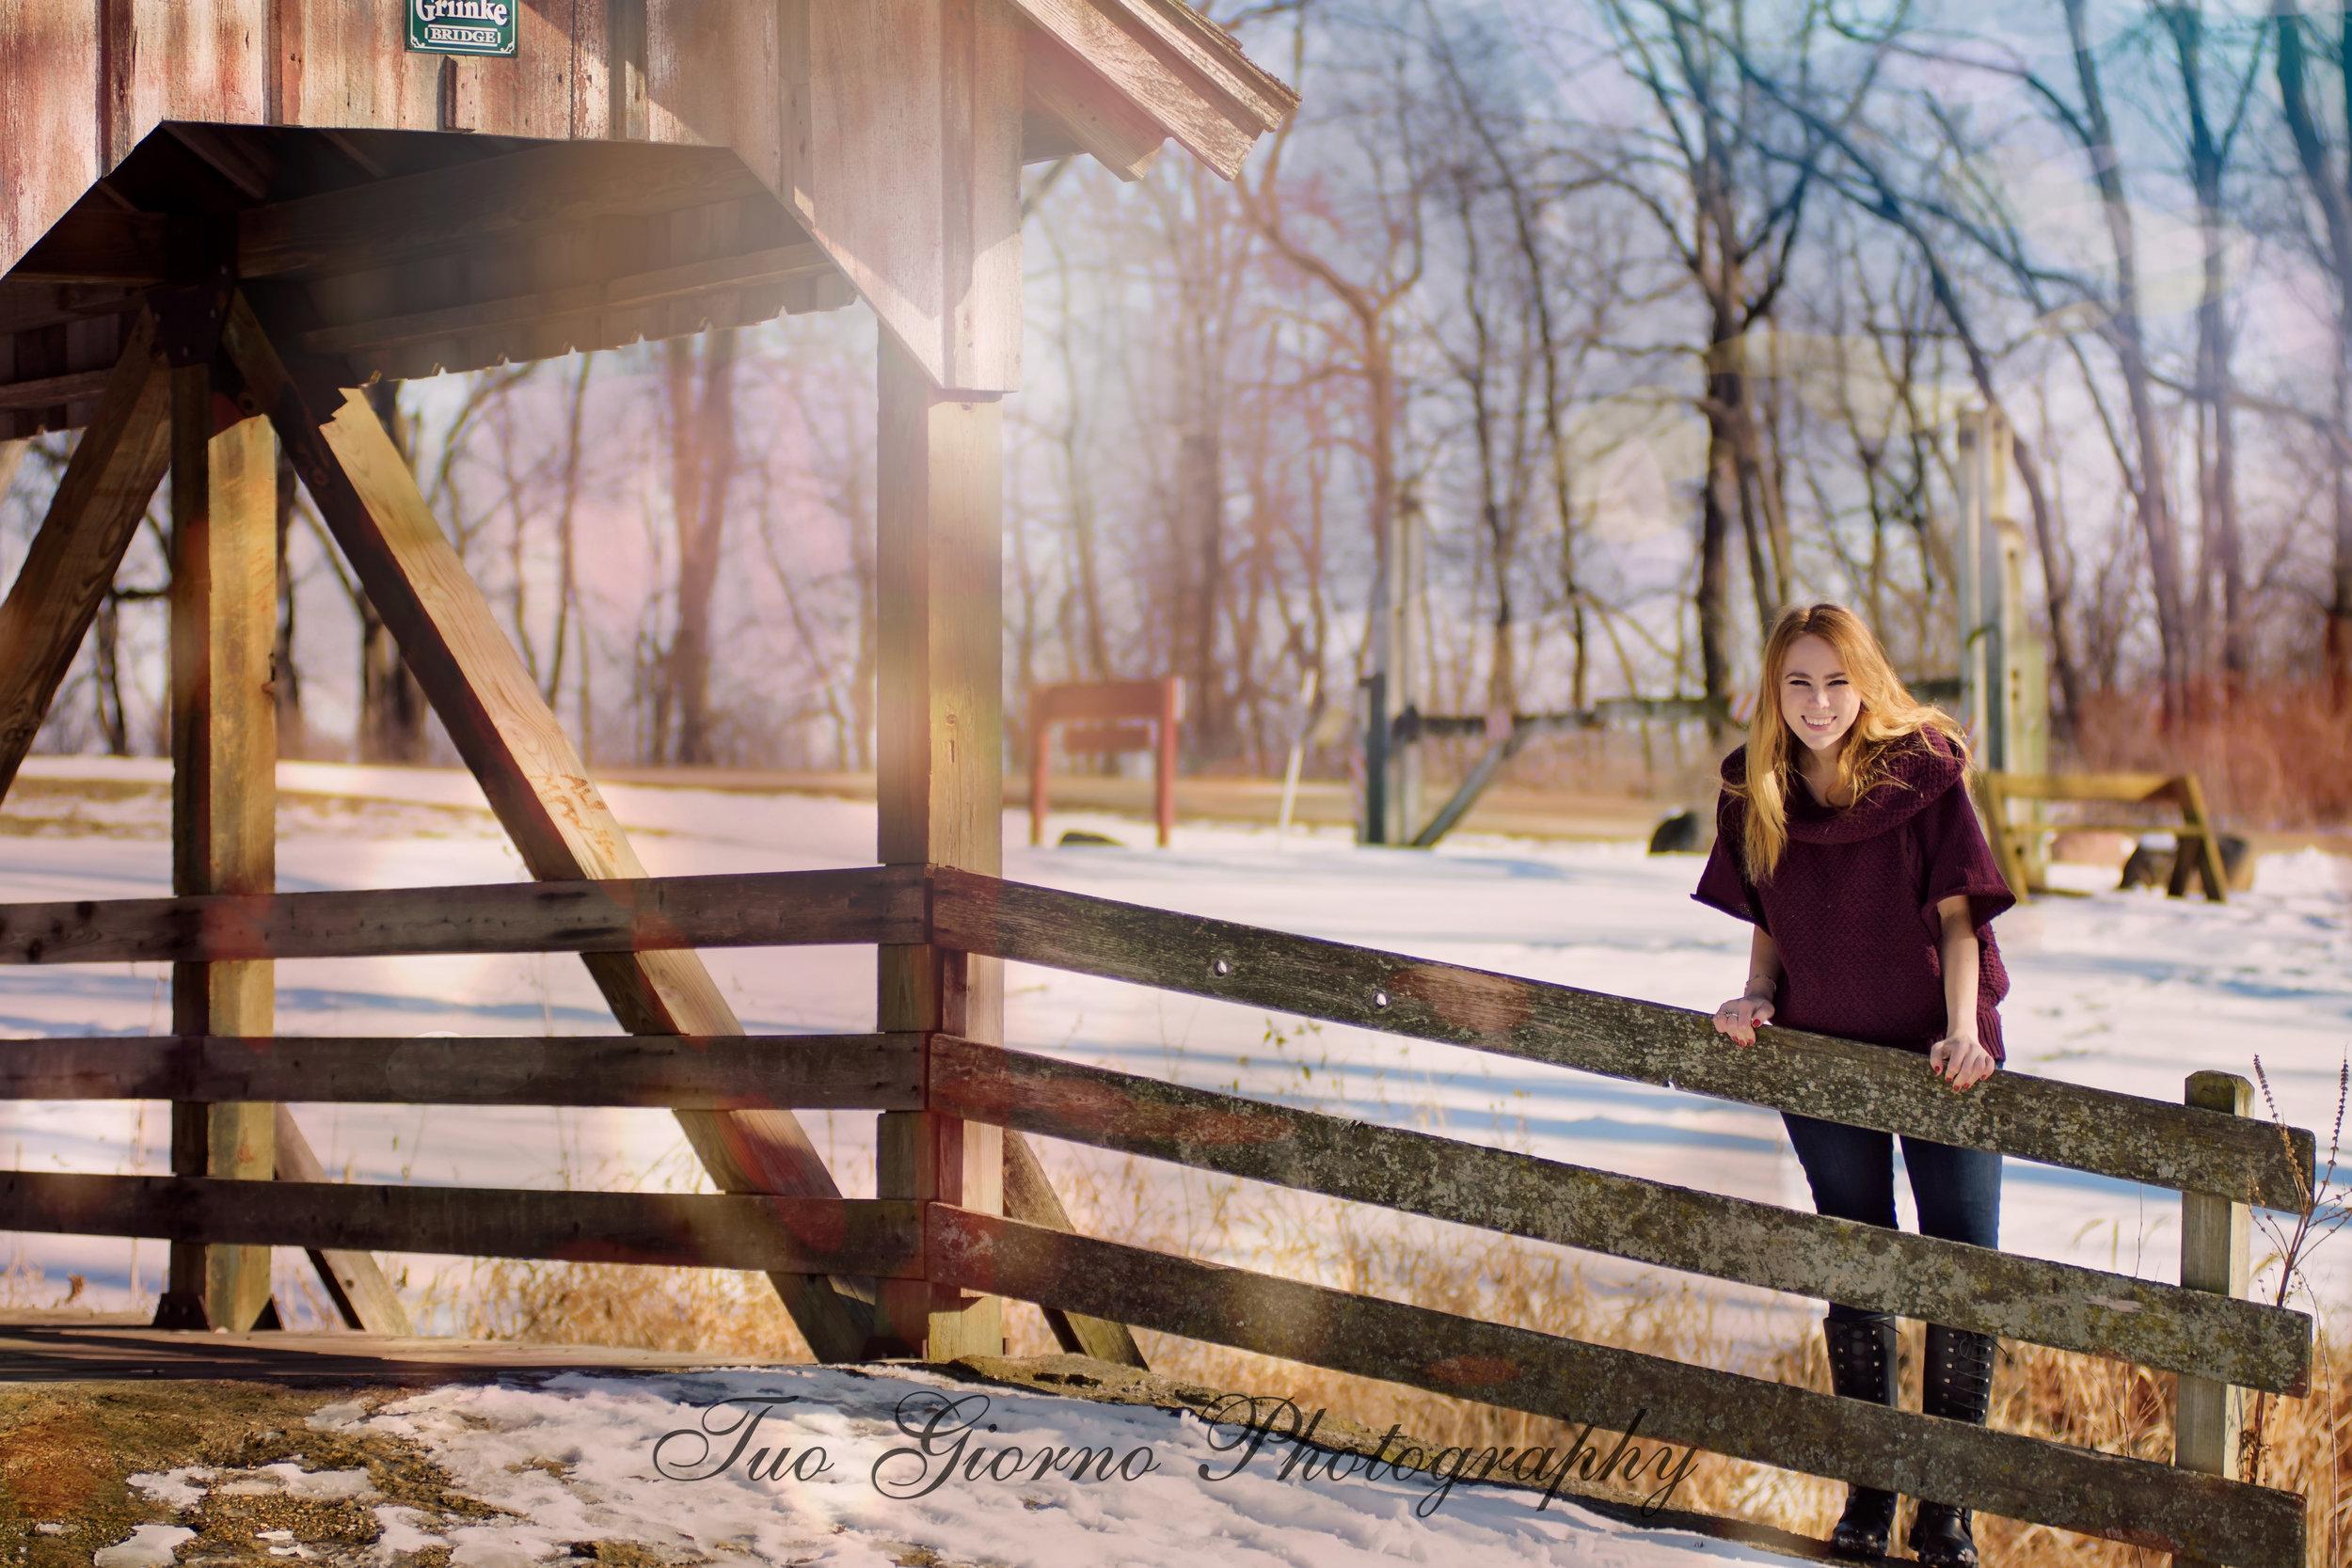 Livy-Holding-the-rails.jpg